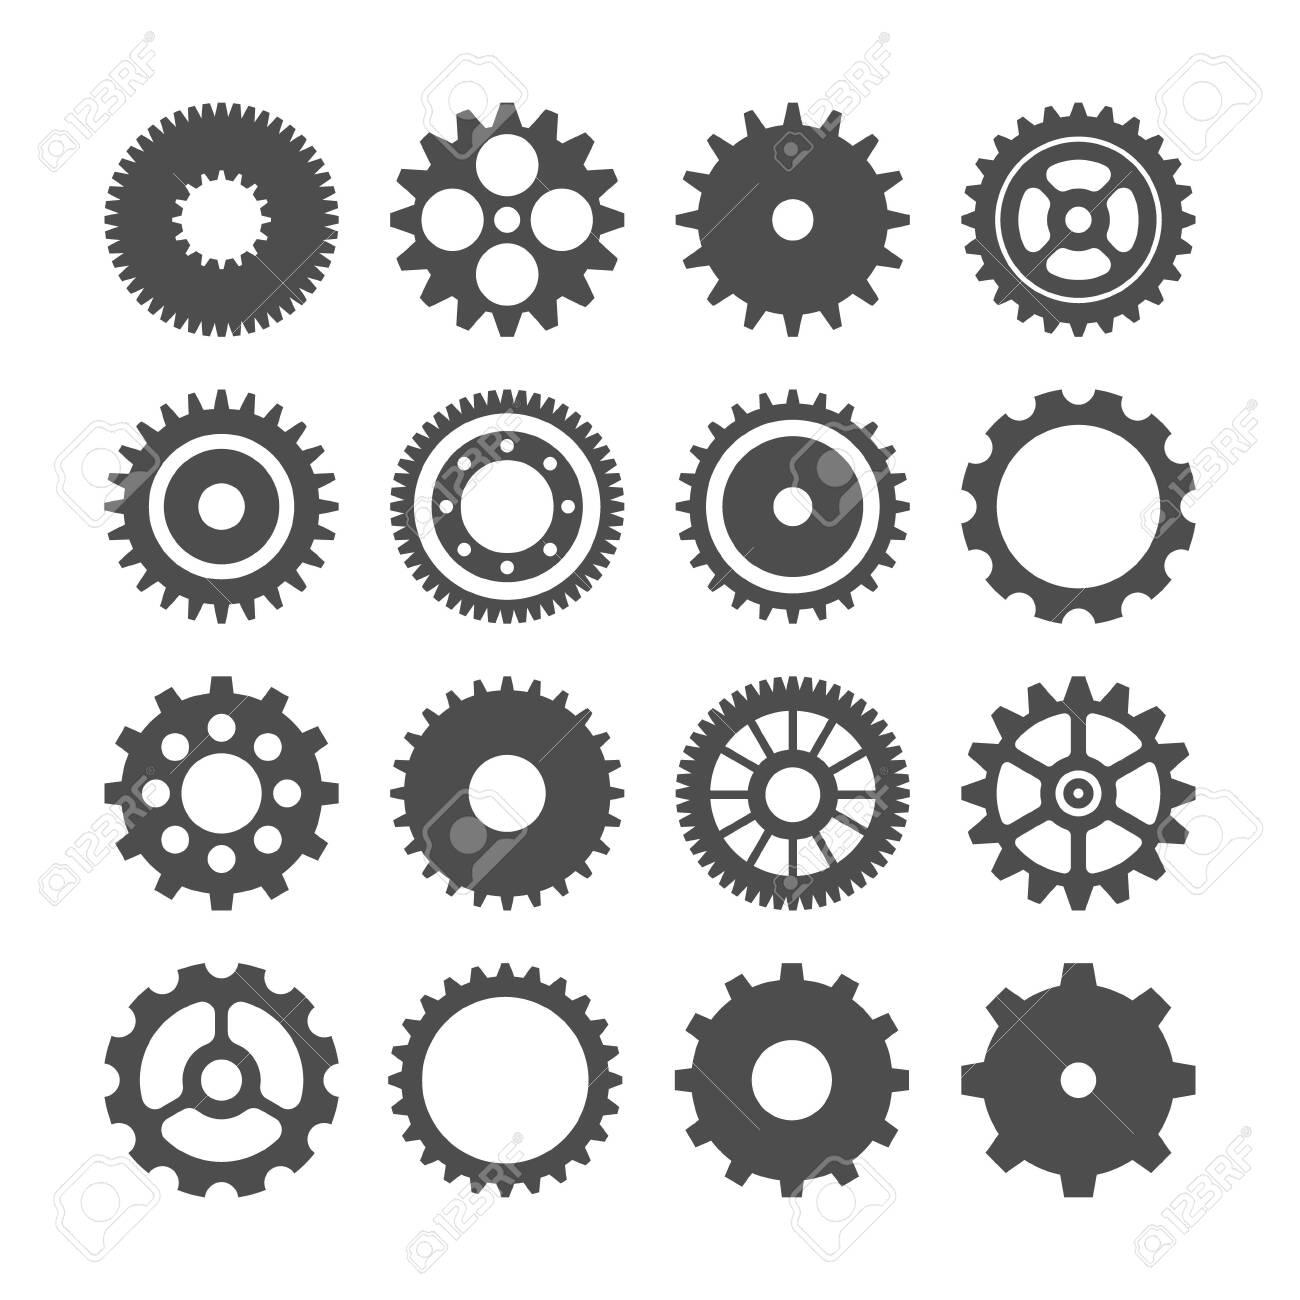 Gear wheels set. Retro vintage cogwheels collection. Industrial icons. Vector illustration - 126493937